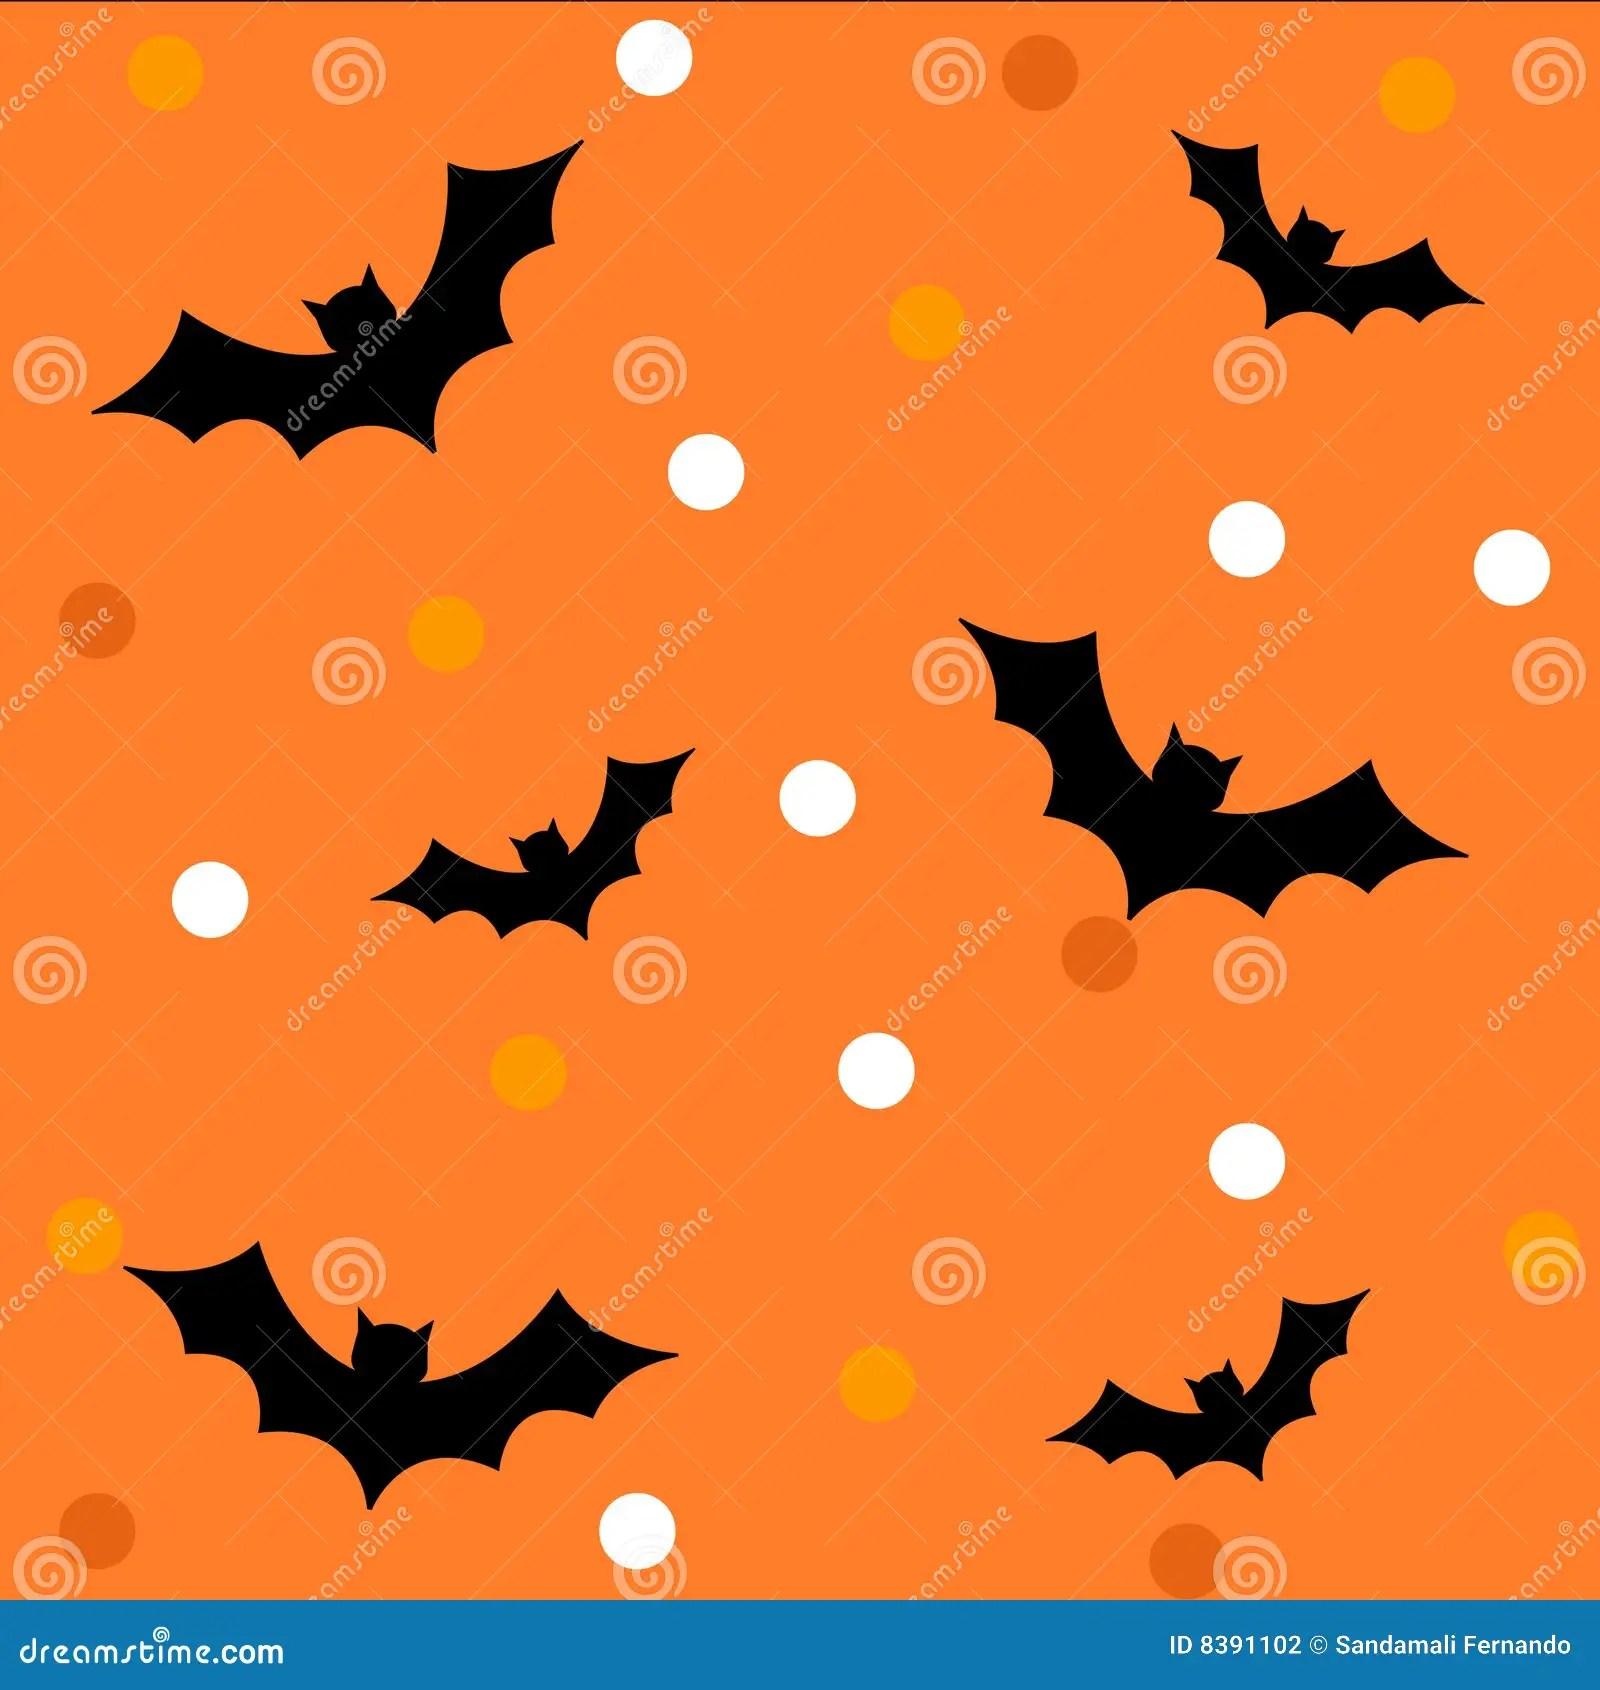 Cute Pumpkin Wallpaper Halloween Pattern Background Stock Photography Image